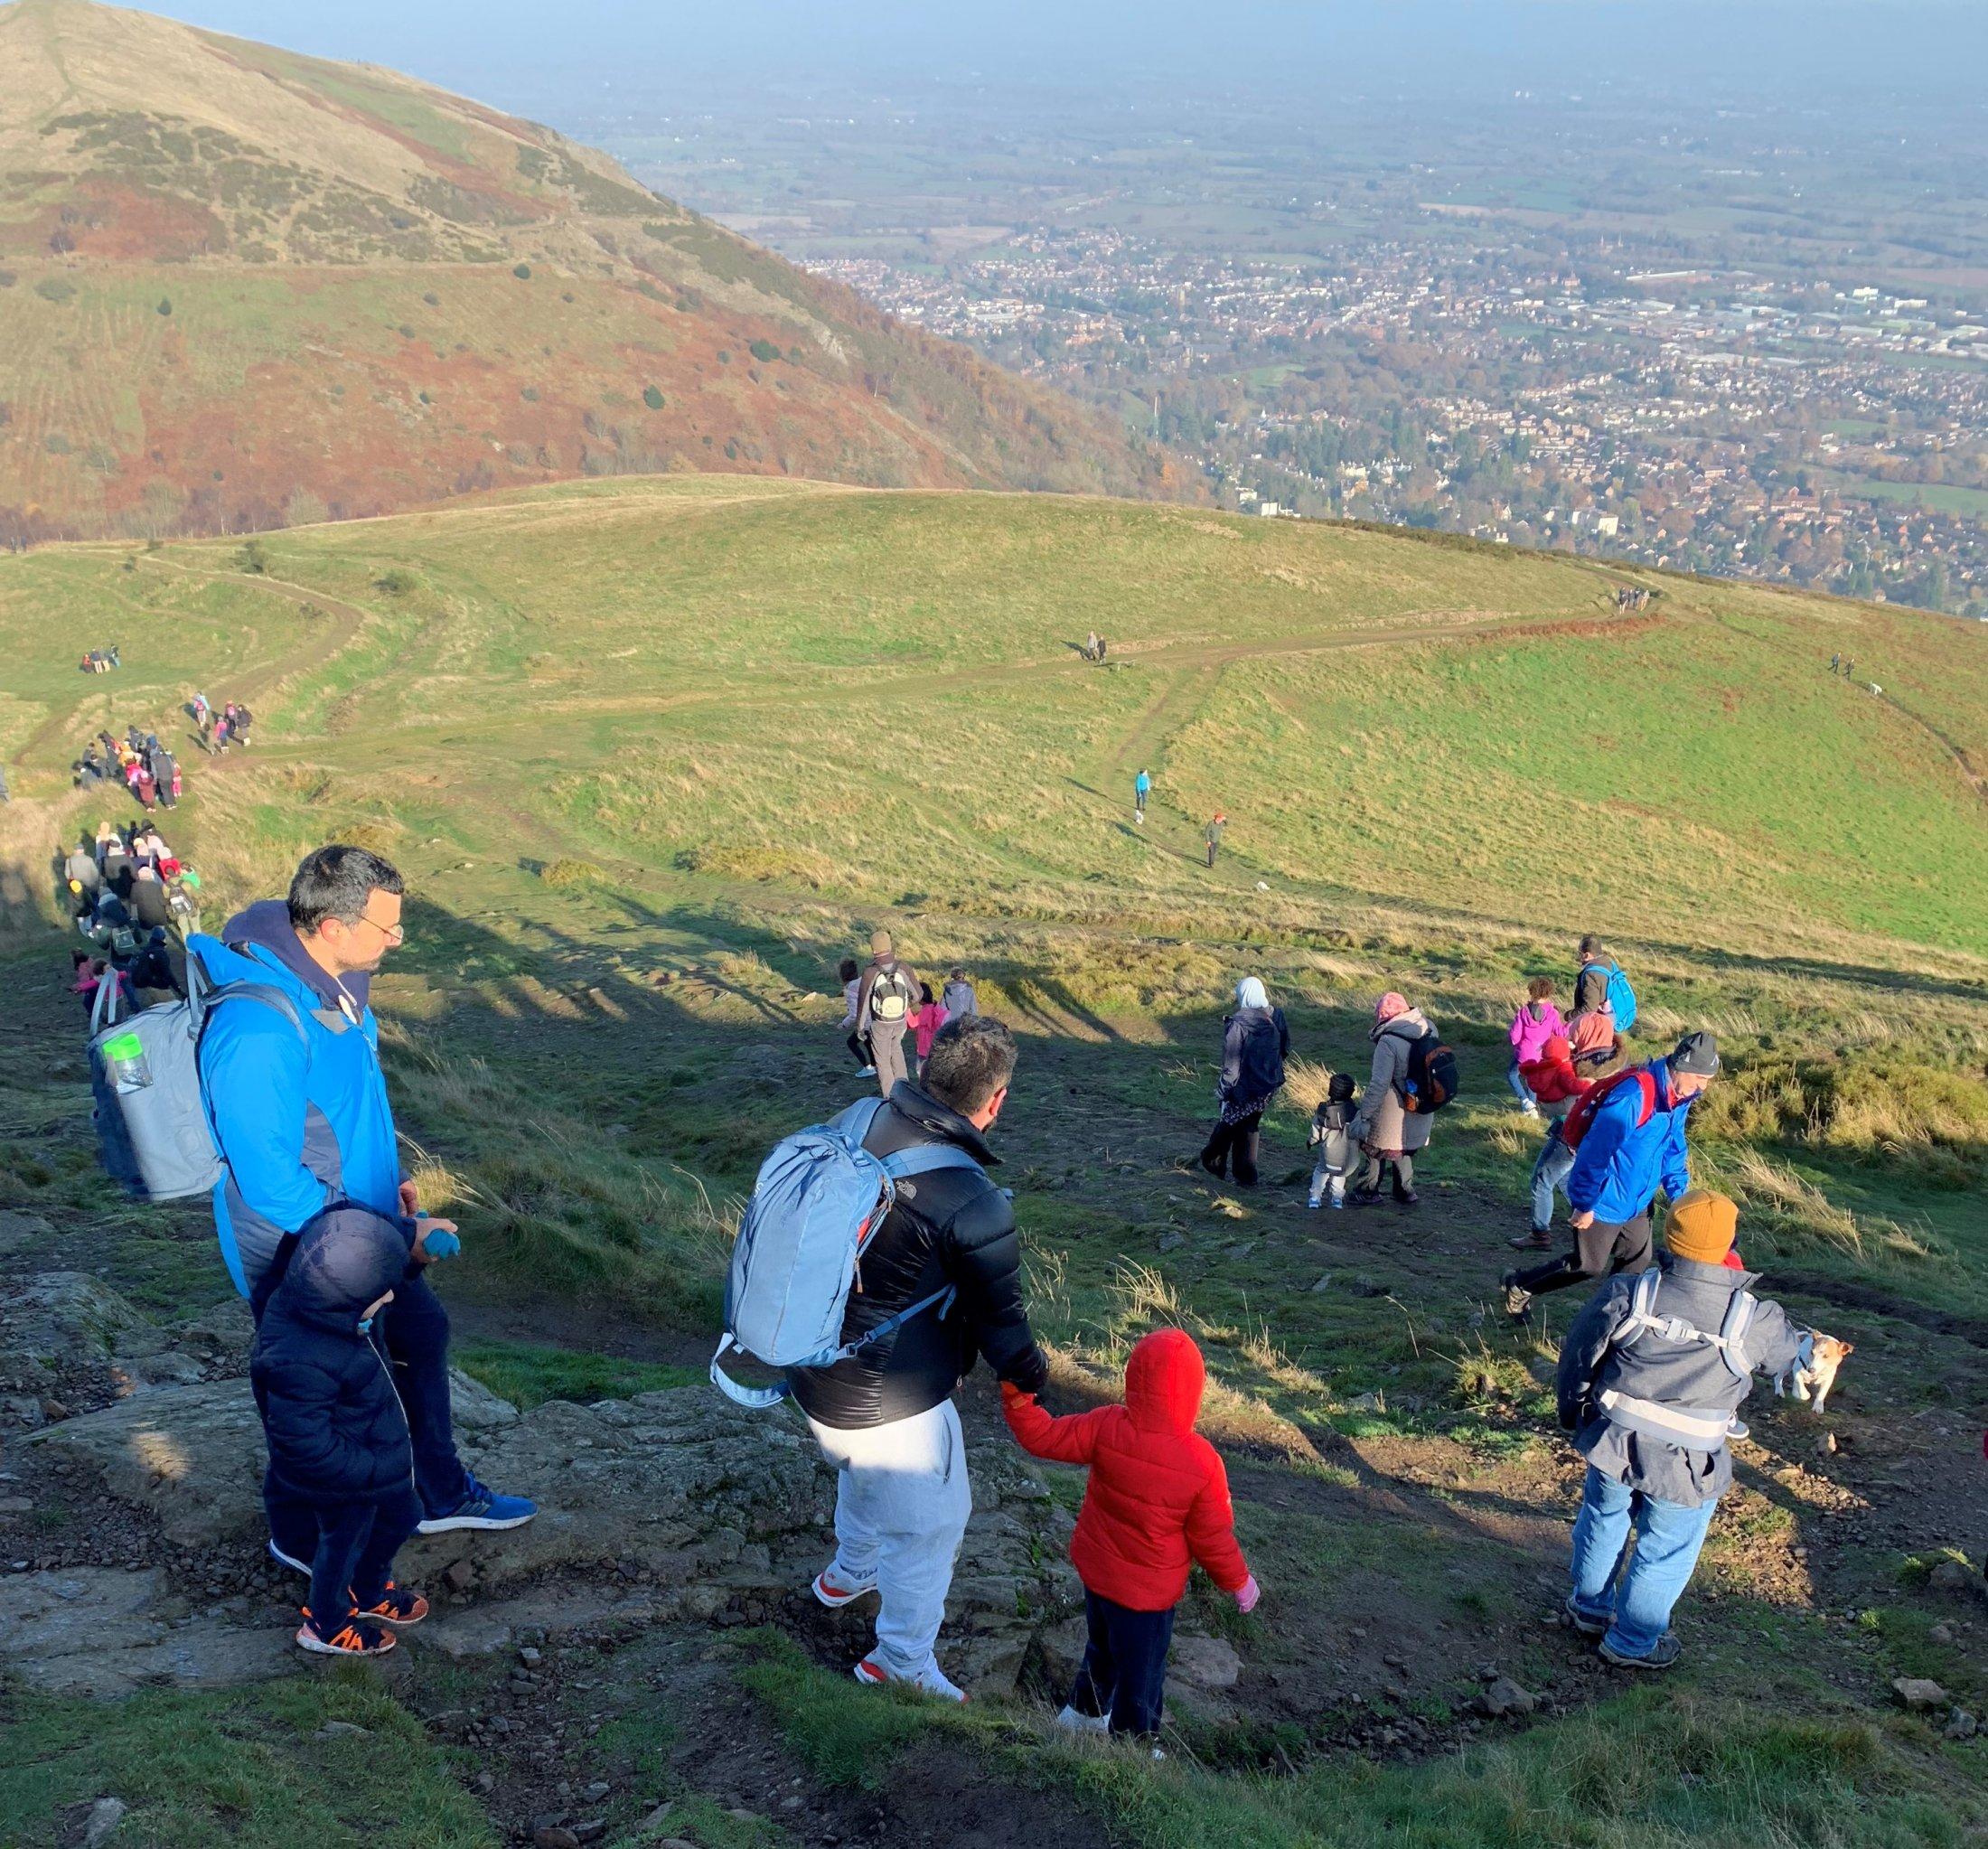 The 2018 TOP Trek took us to the beautiful Malvern Hills